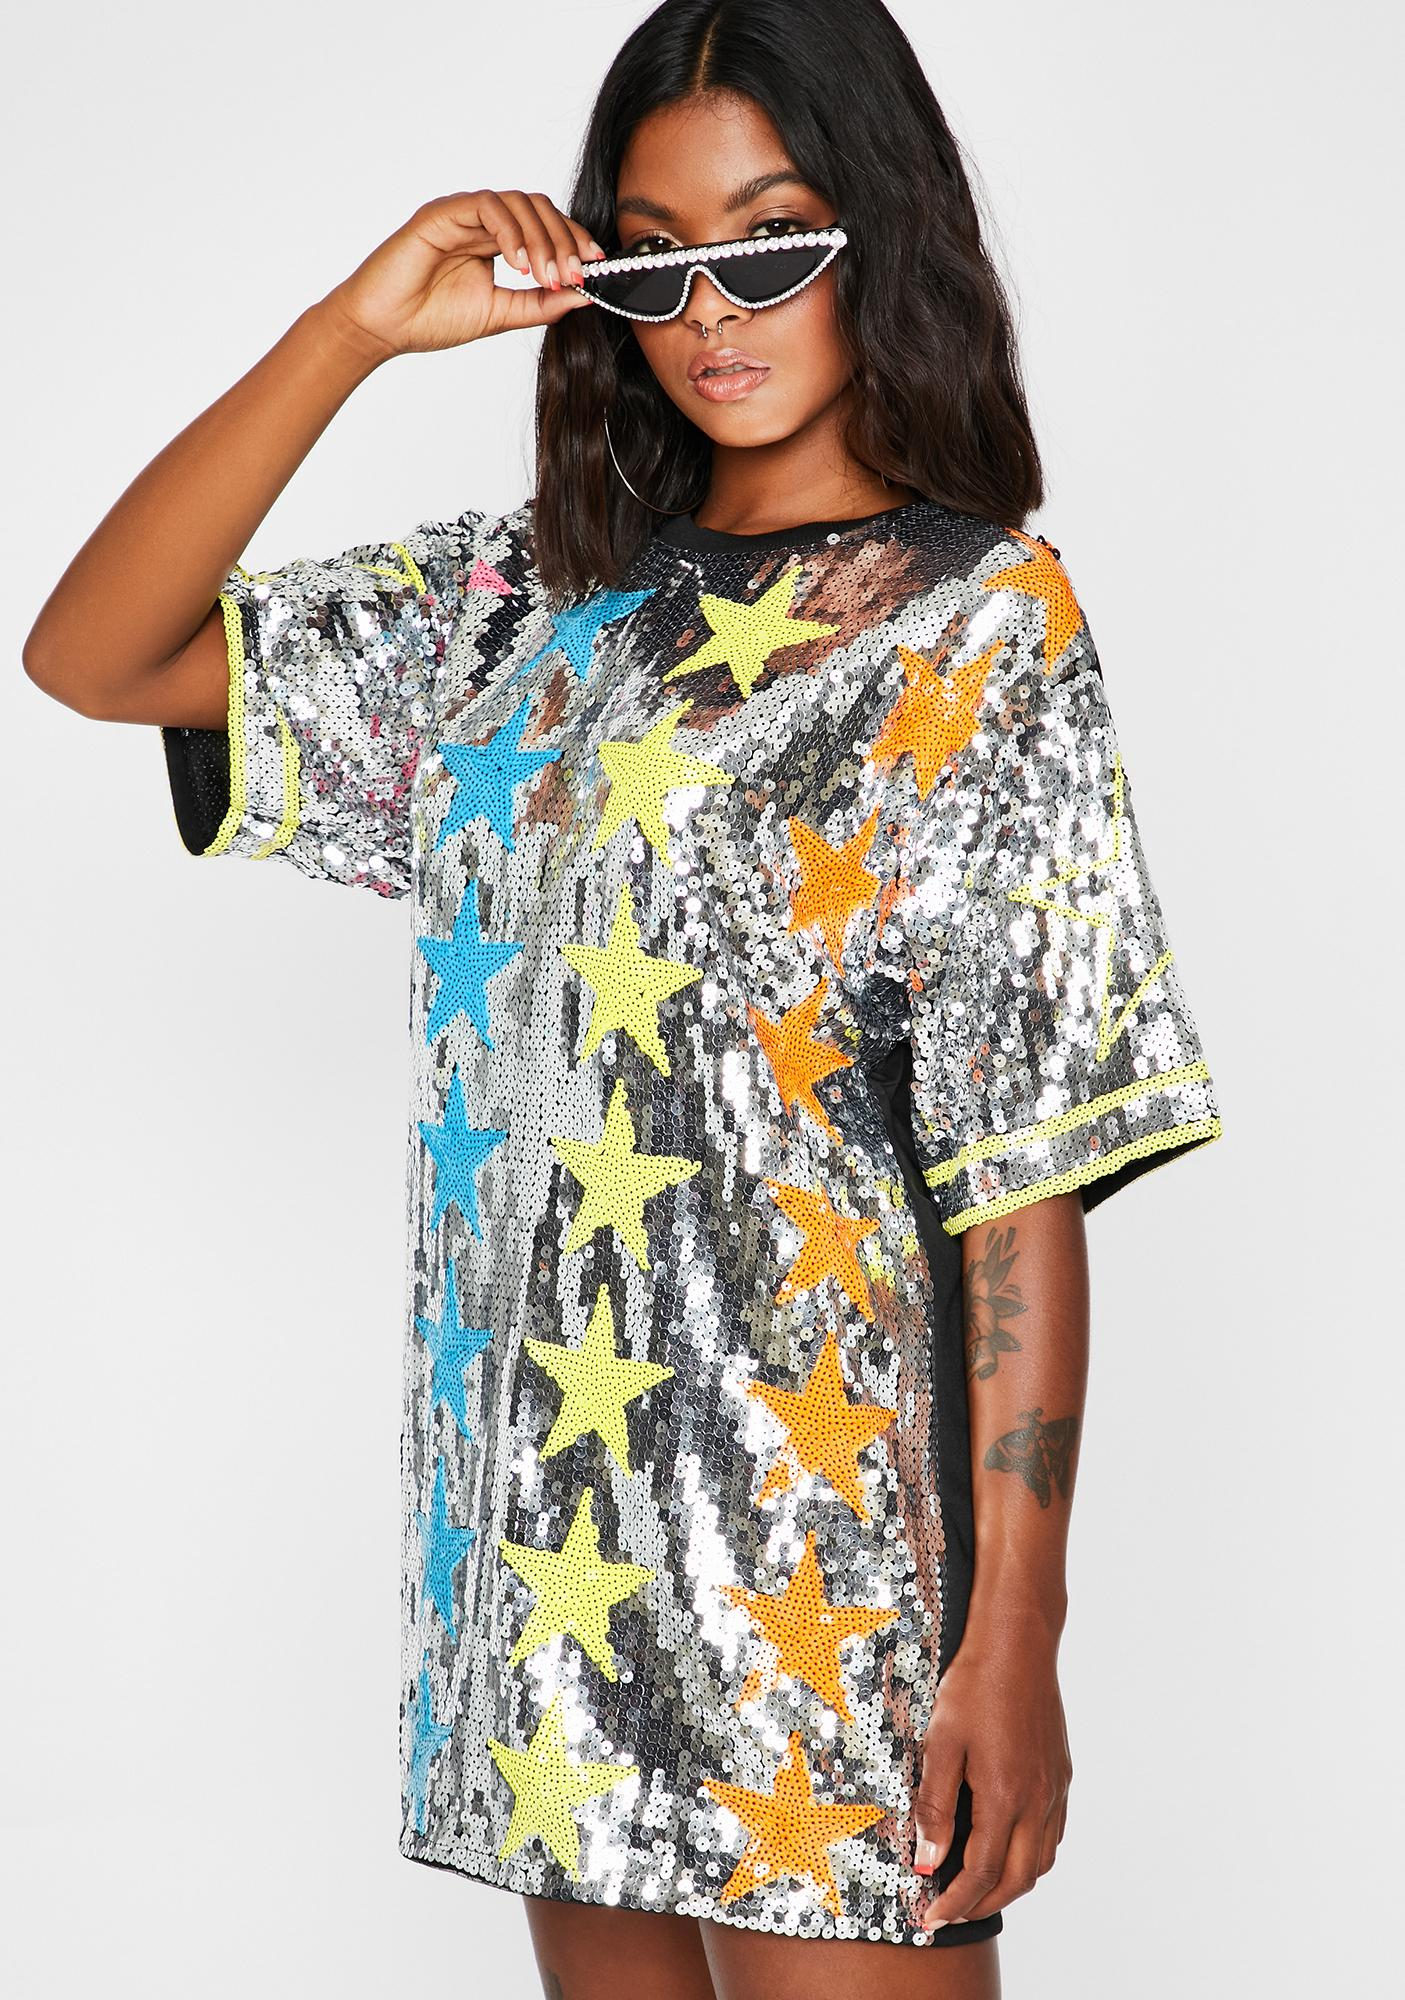 Starlight Starbright Sequin T-Shirt Dress